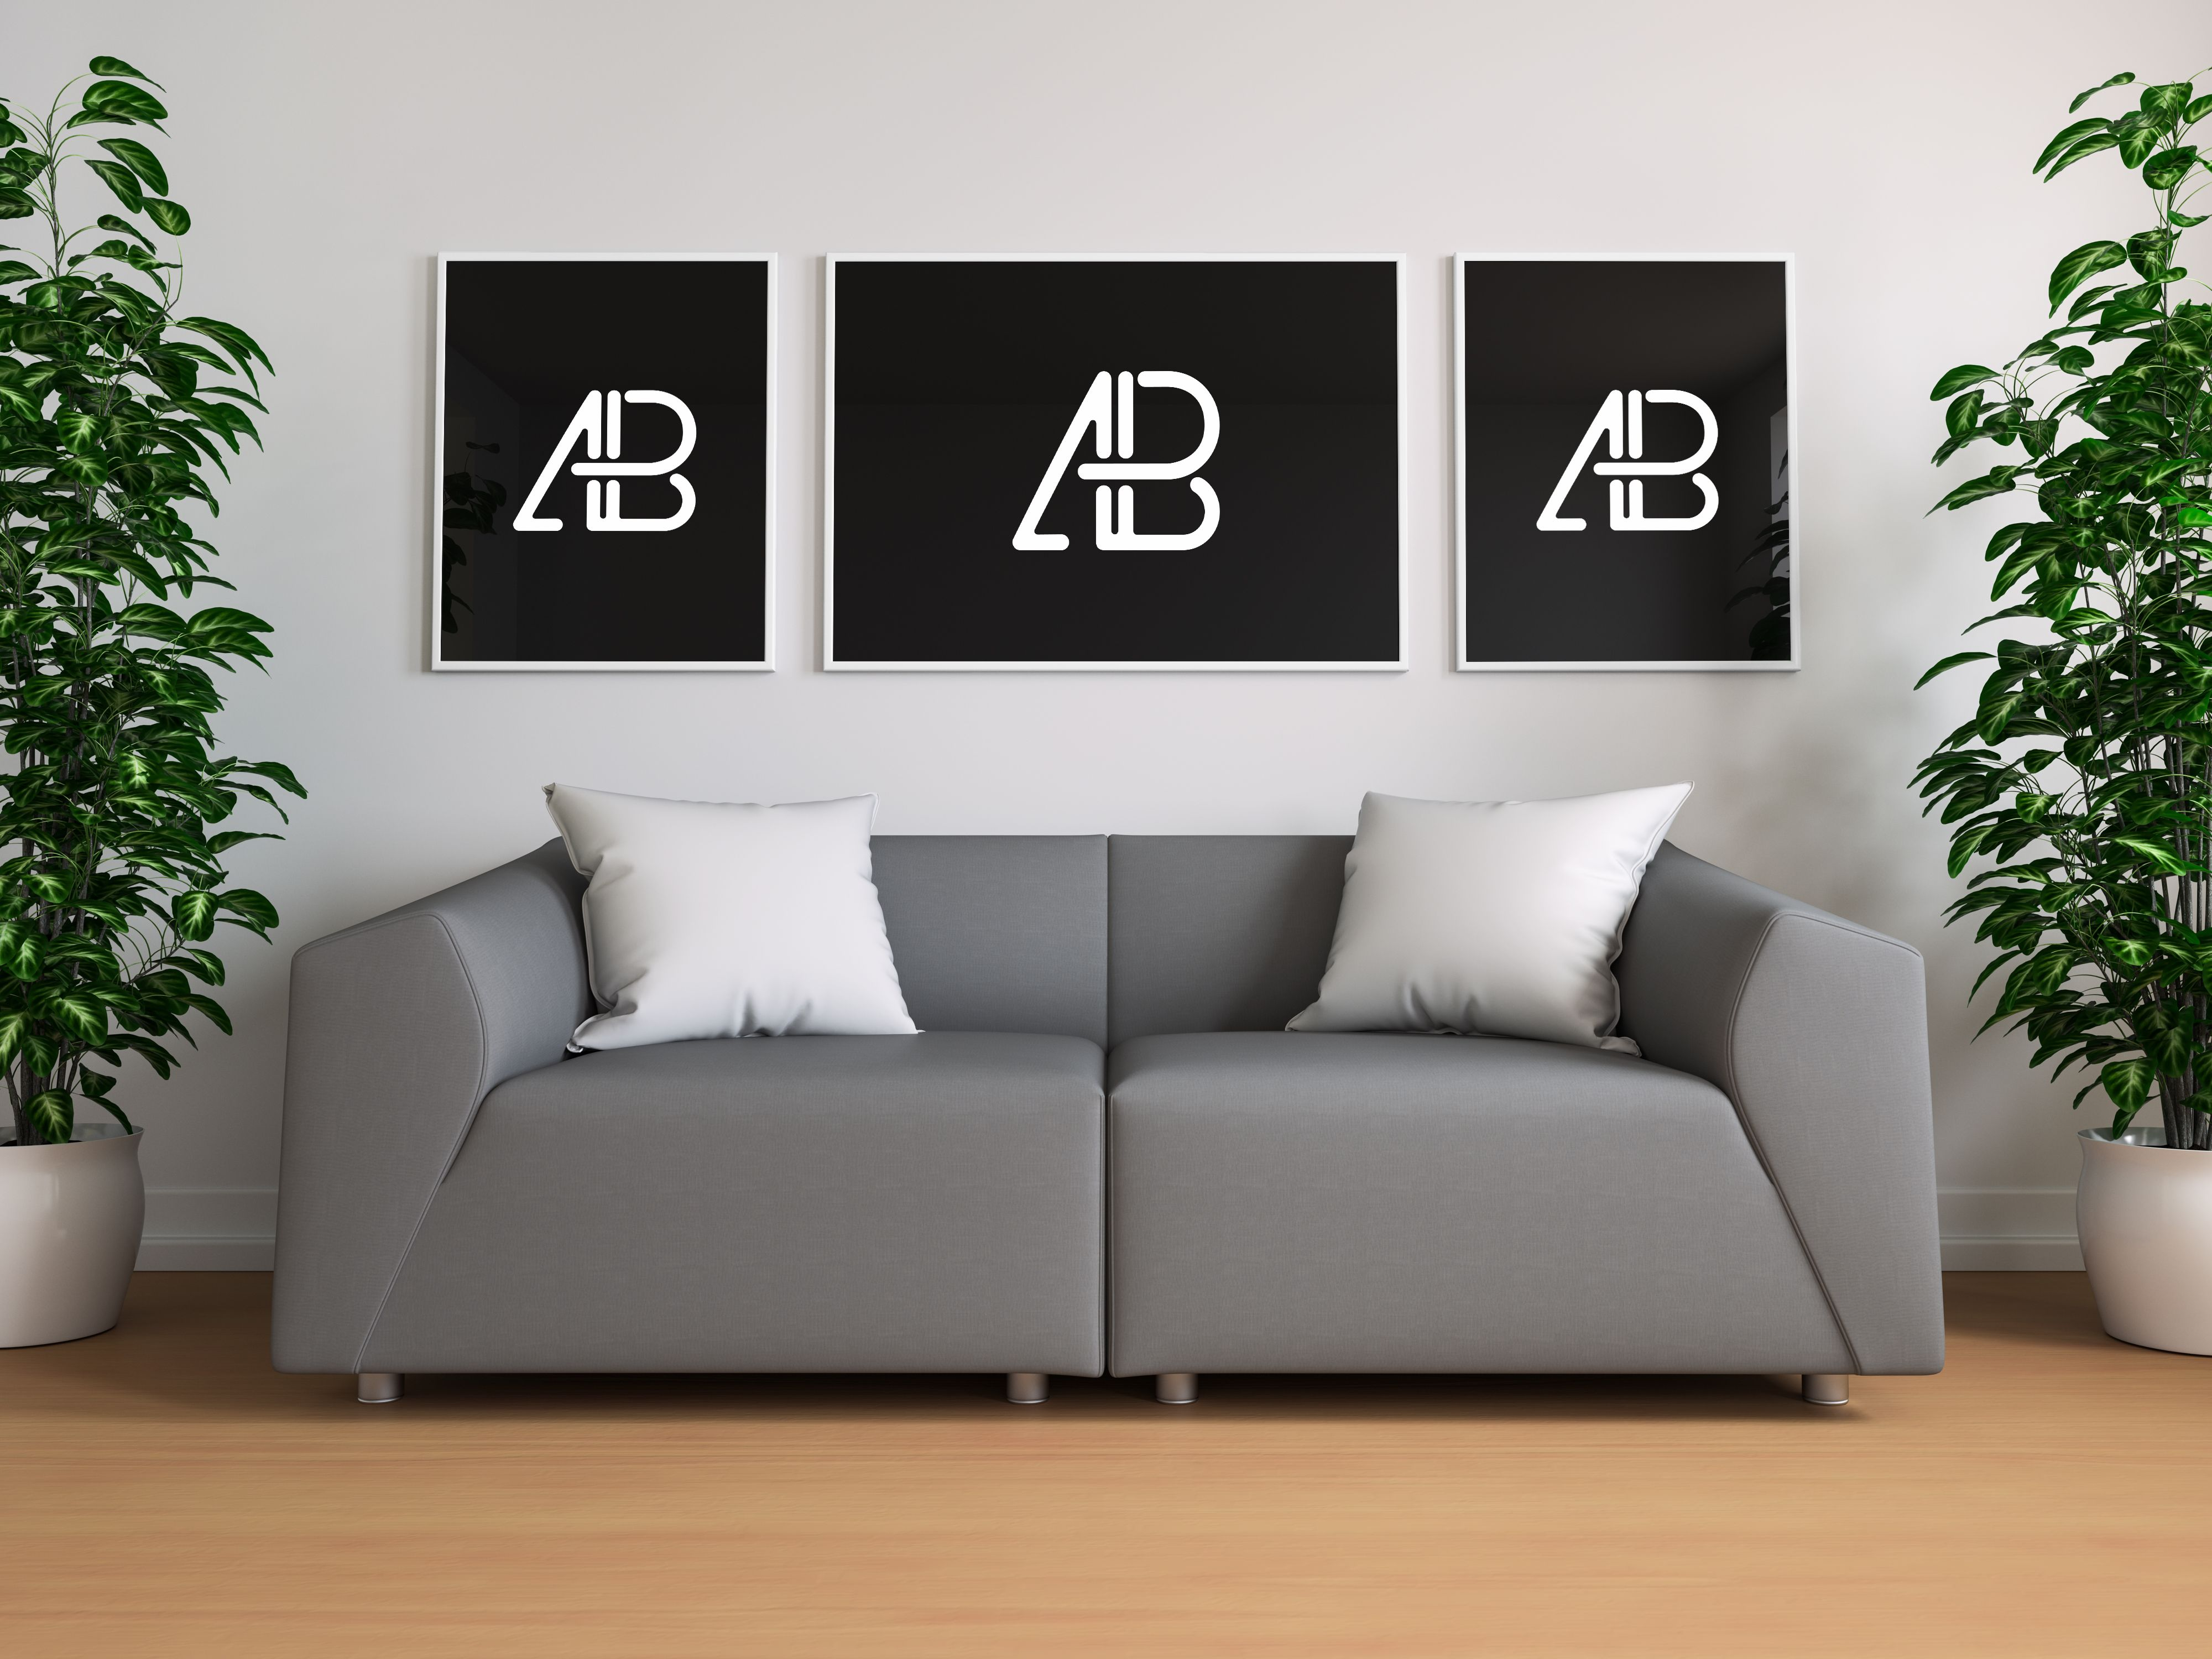 Triple Poster In Living Room Mockup Poster Mockup Frames On Wall Best Free Fonts